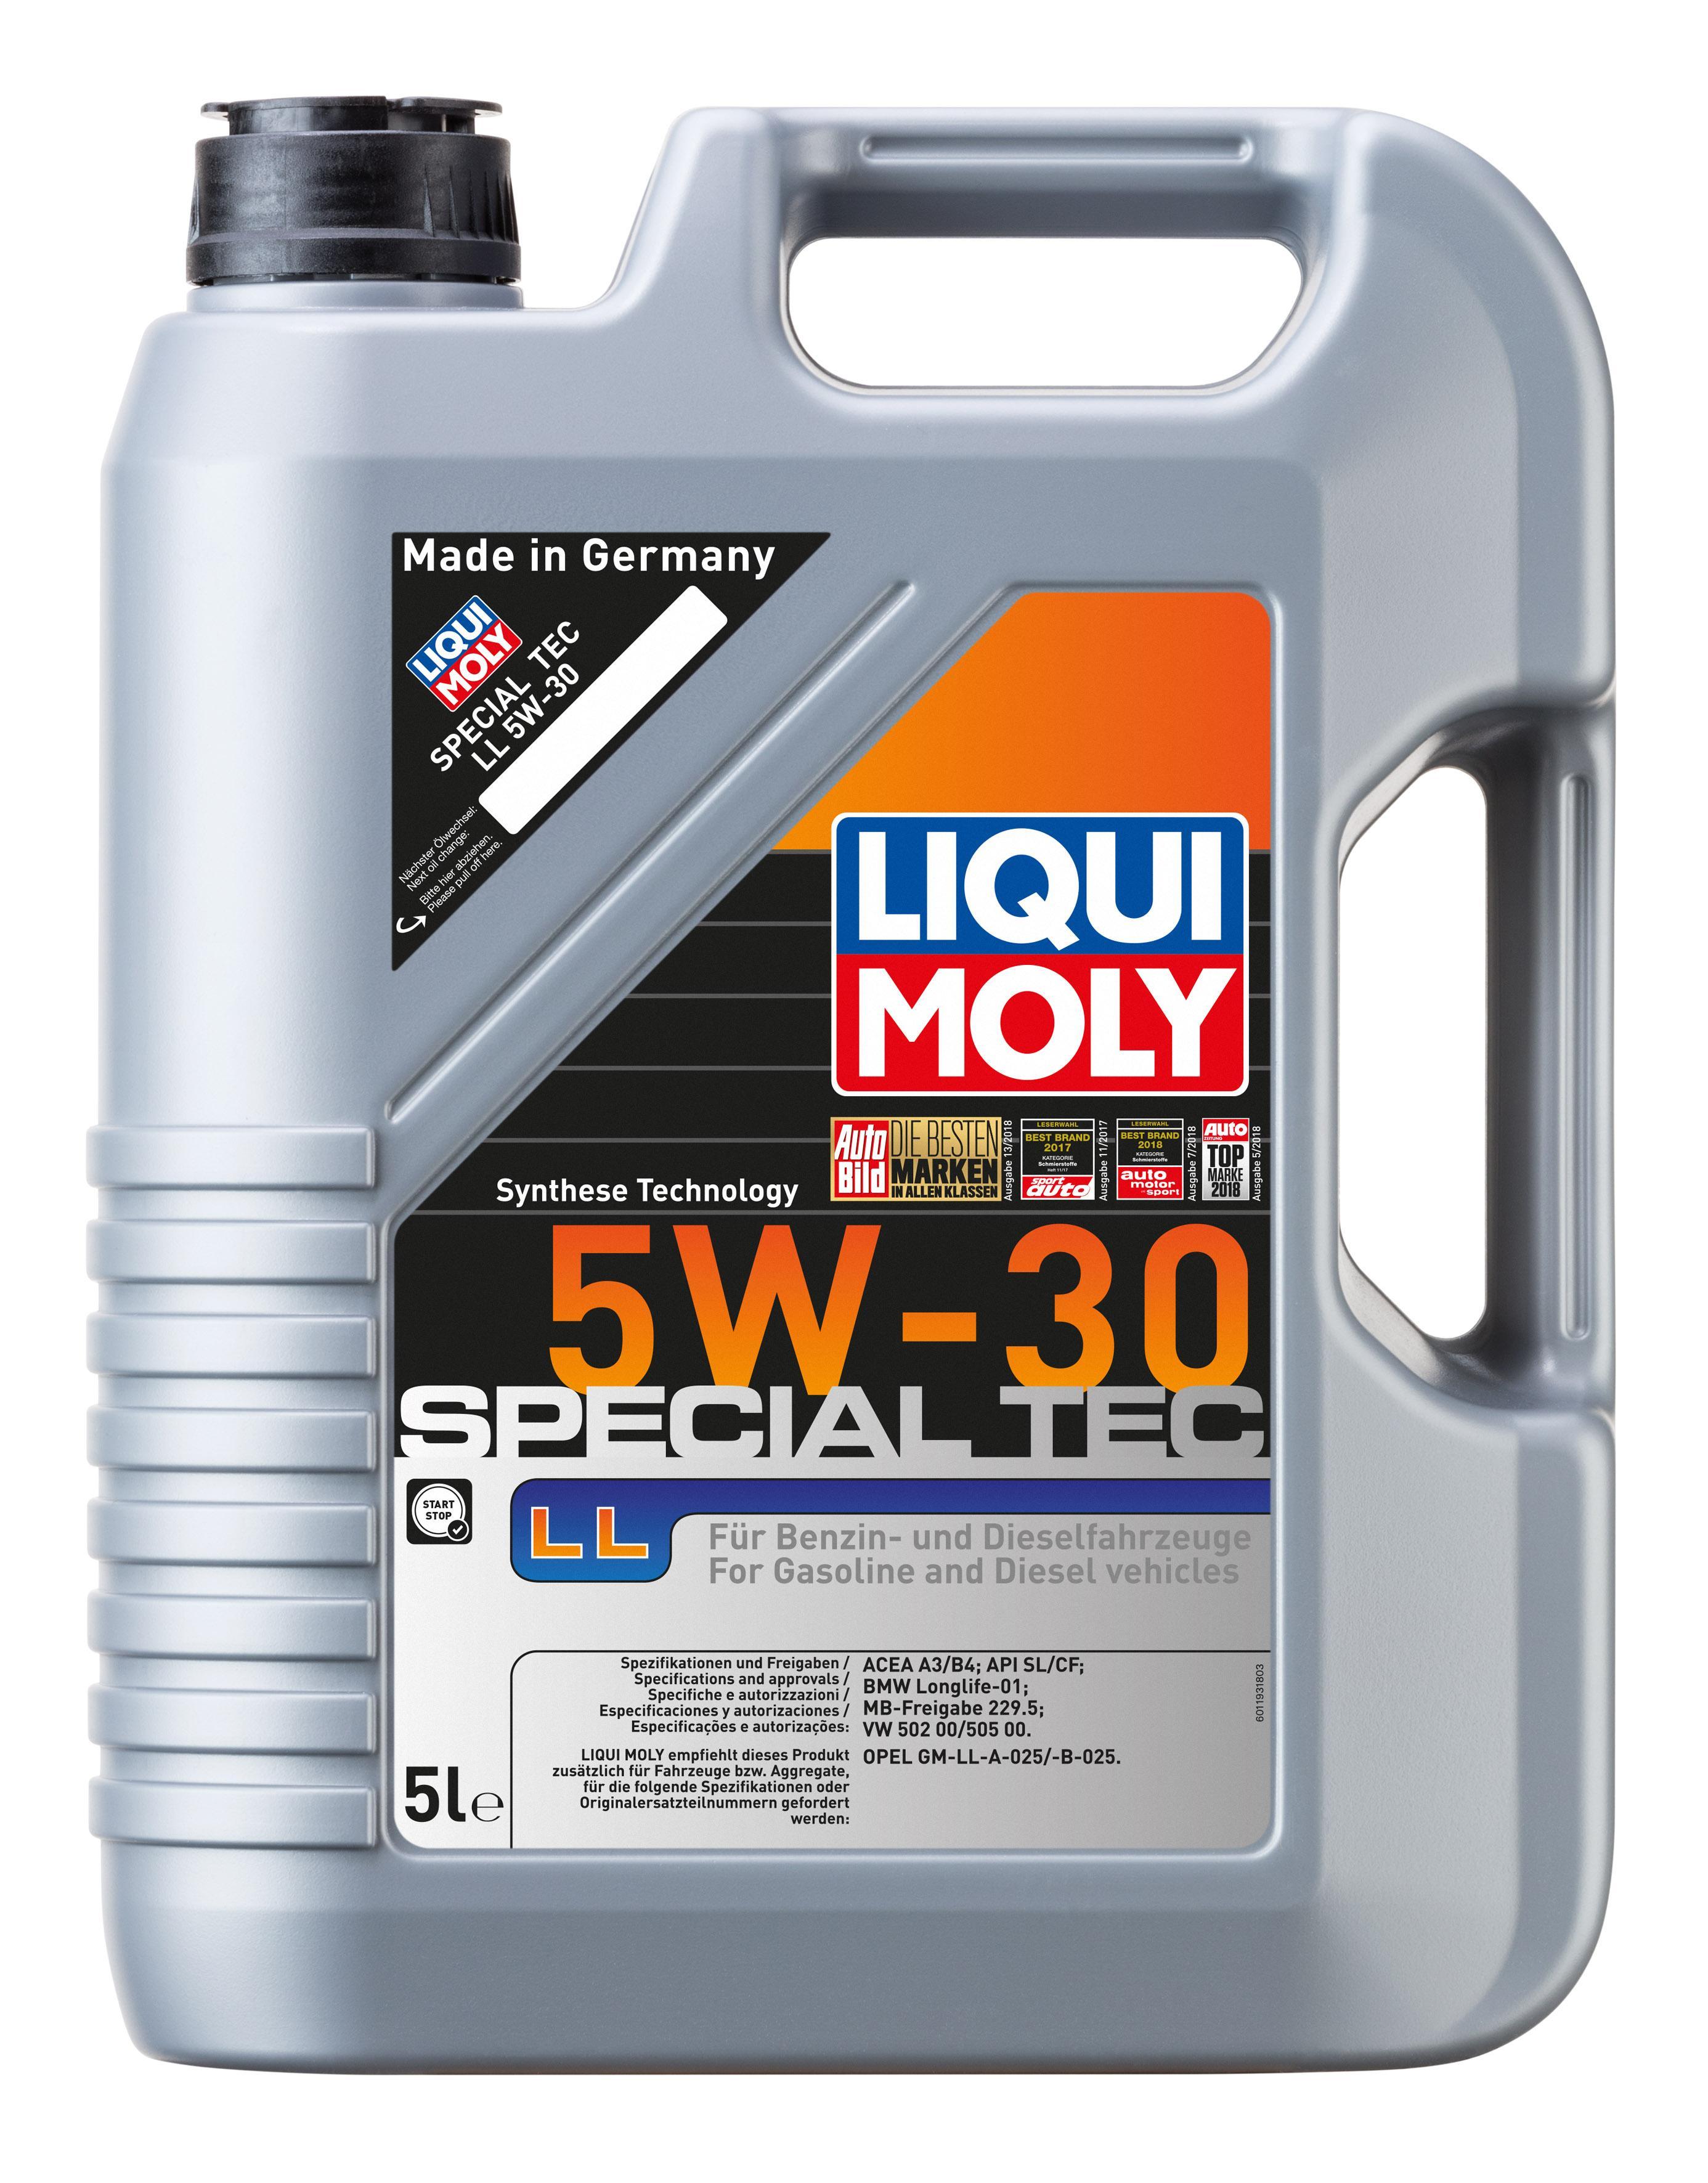 1193 ol LIQUI MOLY OpelGMLLB025 - Große Auswahl - stark reduziert